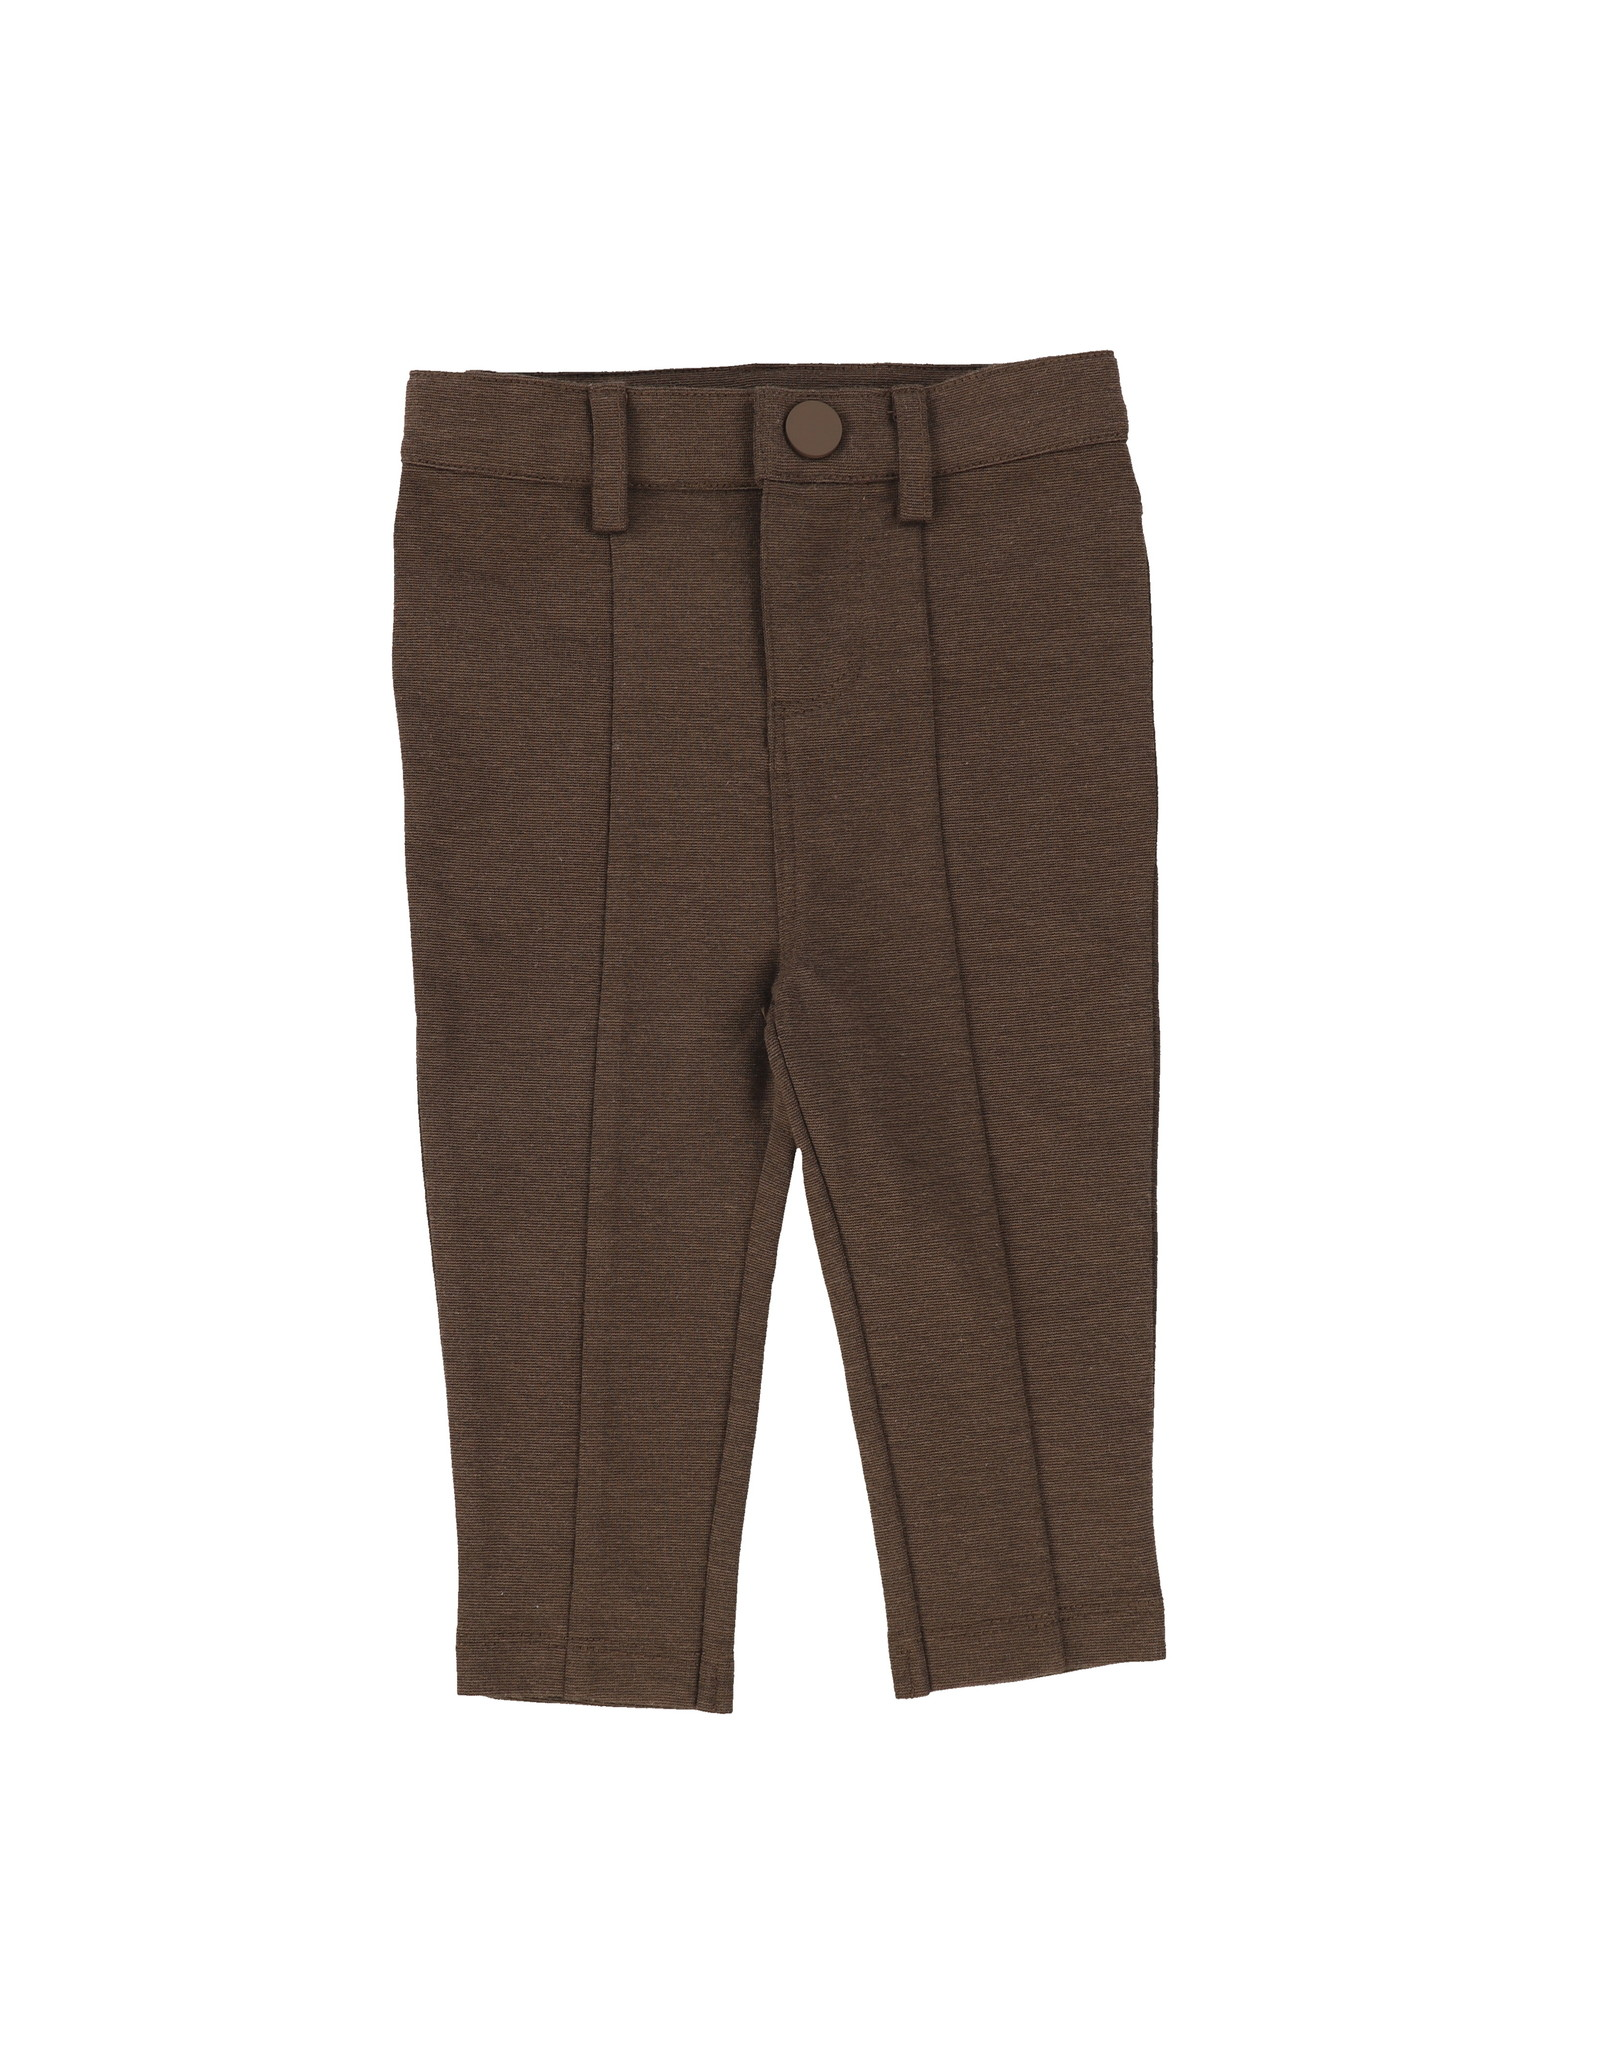 LIL LEGS FW20 Knit Pants